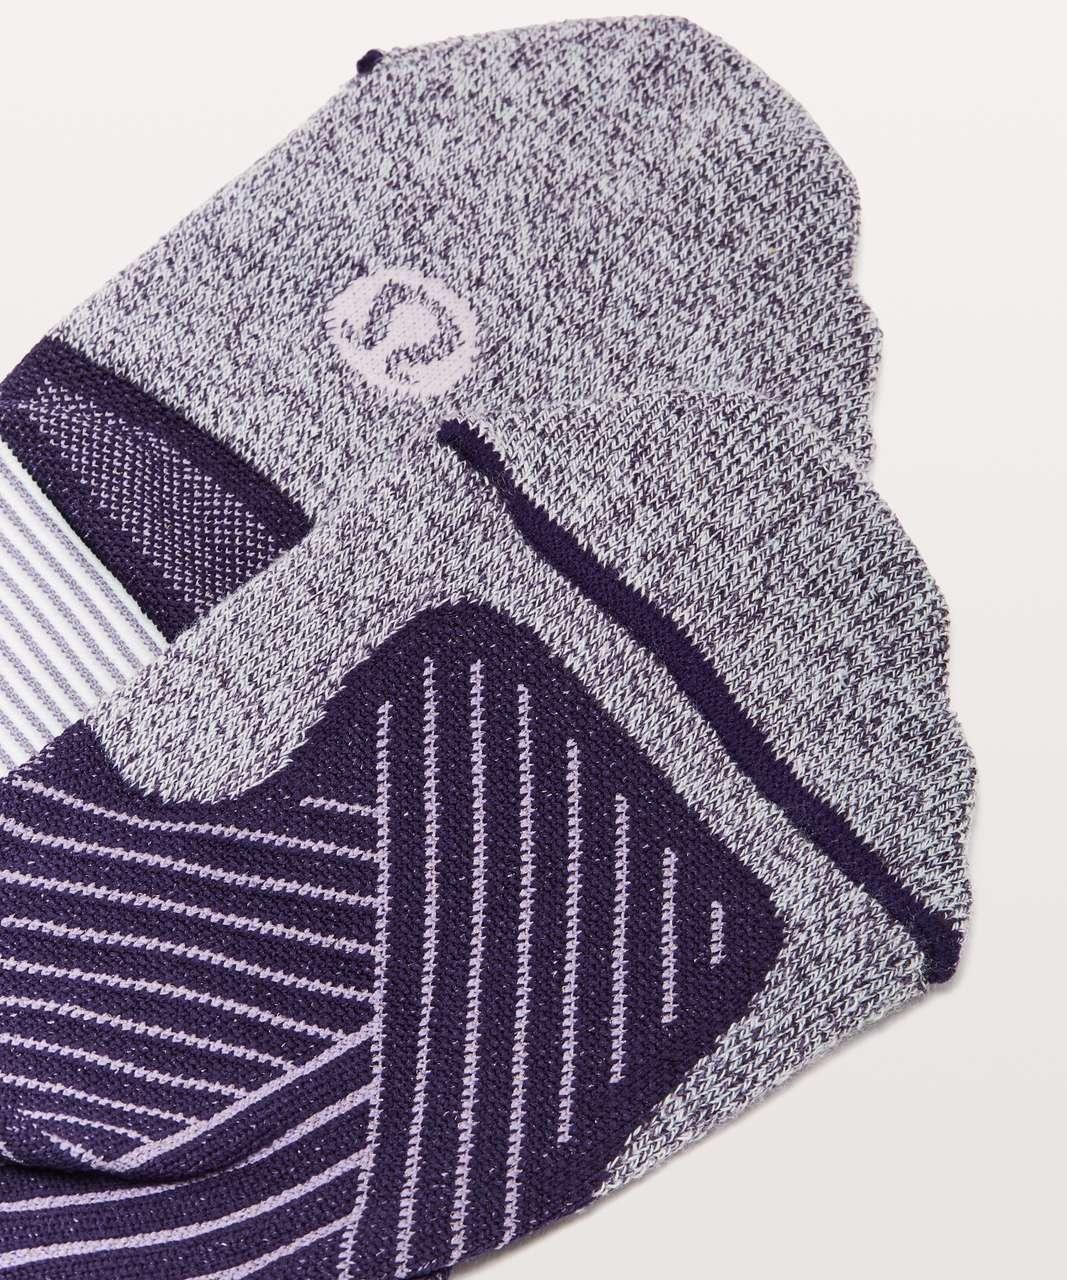 Lululemon Speed Sock *Silver - Dark Court Purple / Enchanted Iris